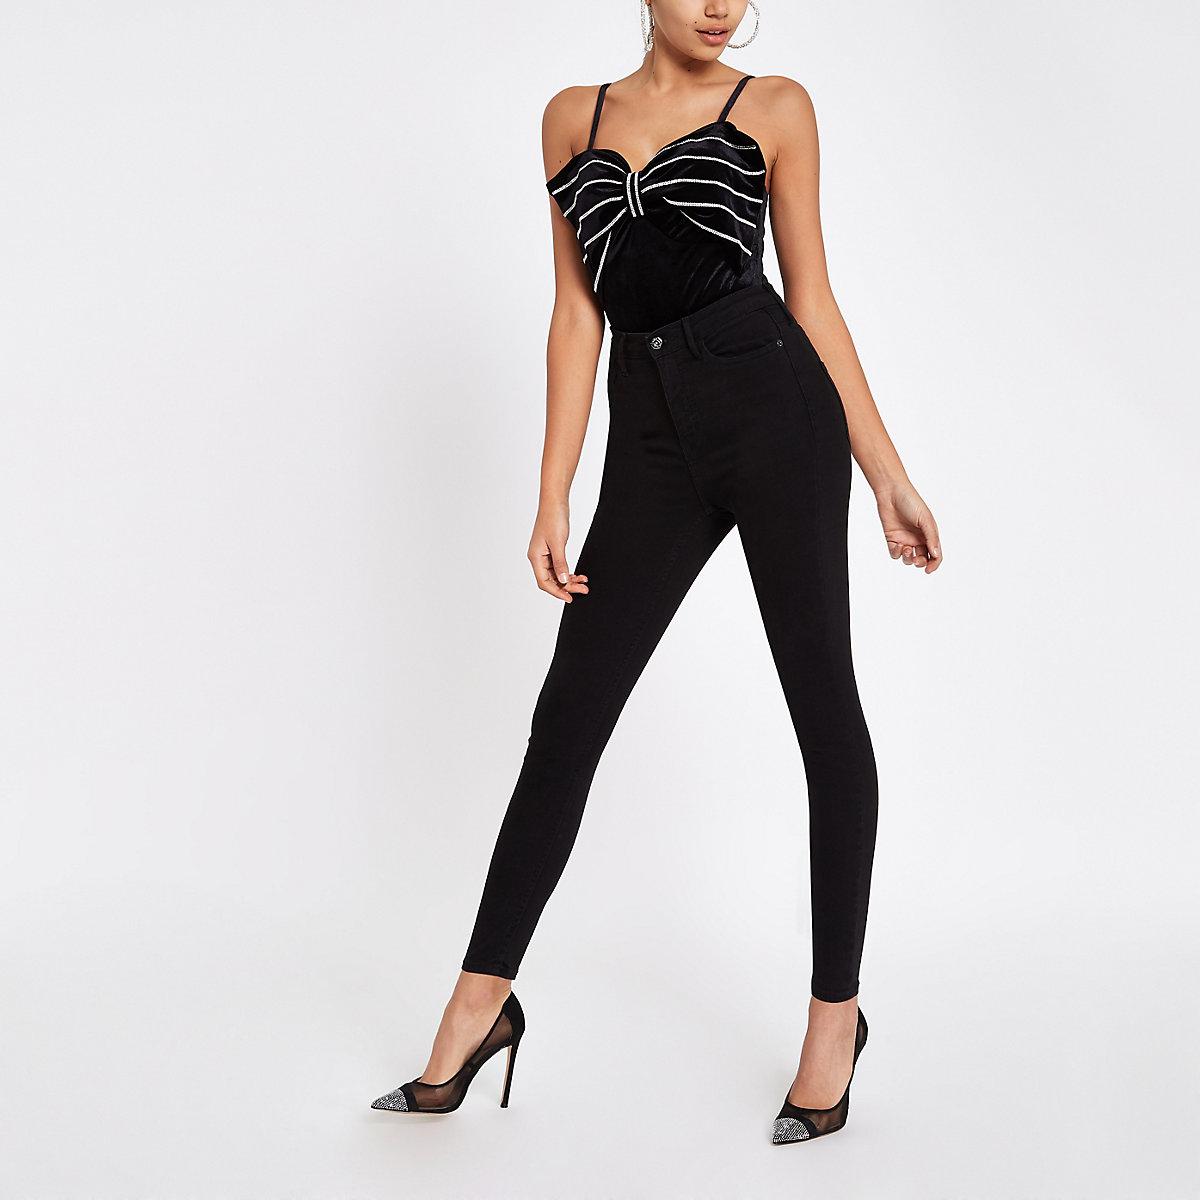 Black diamante bow bodysuit